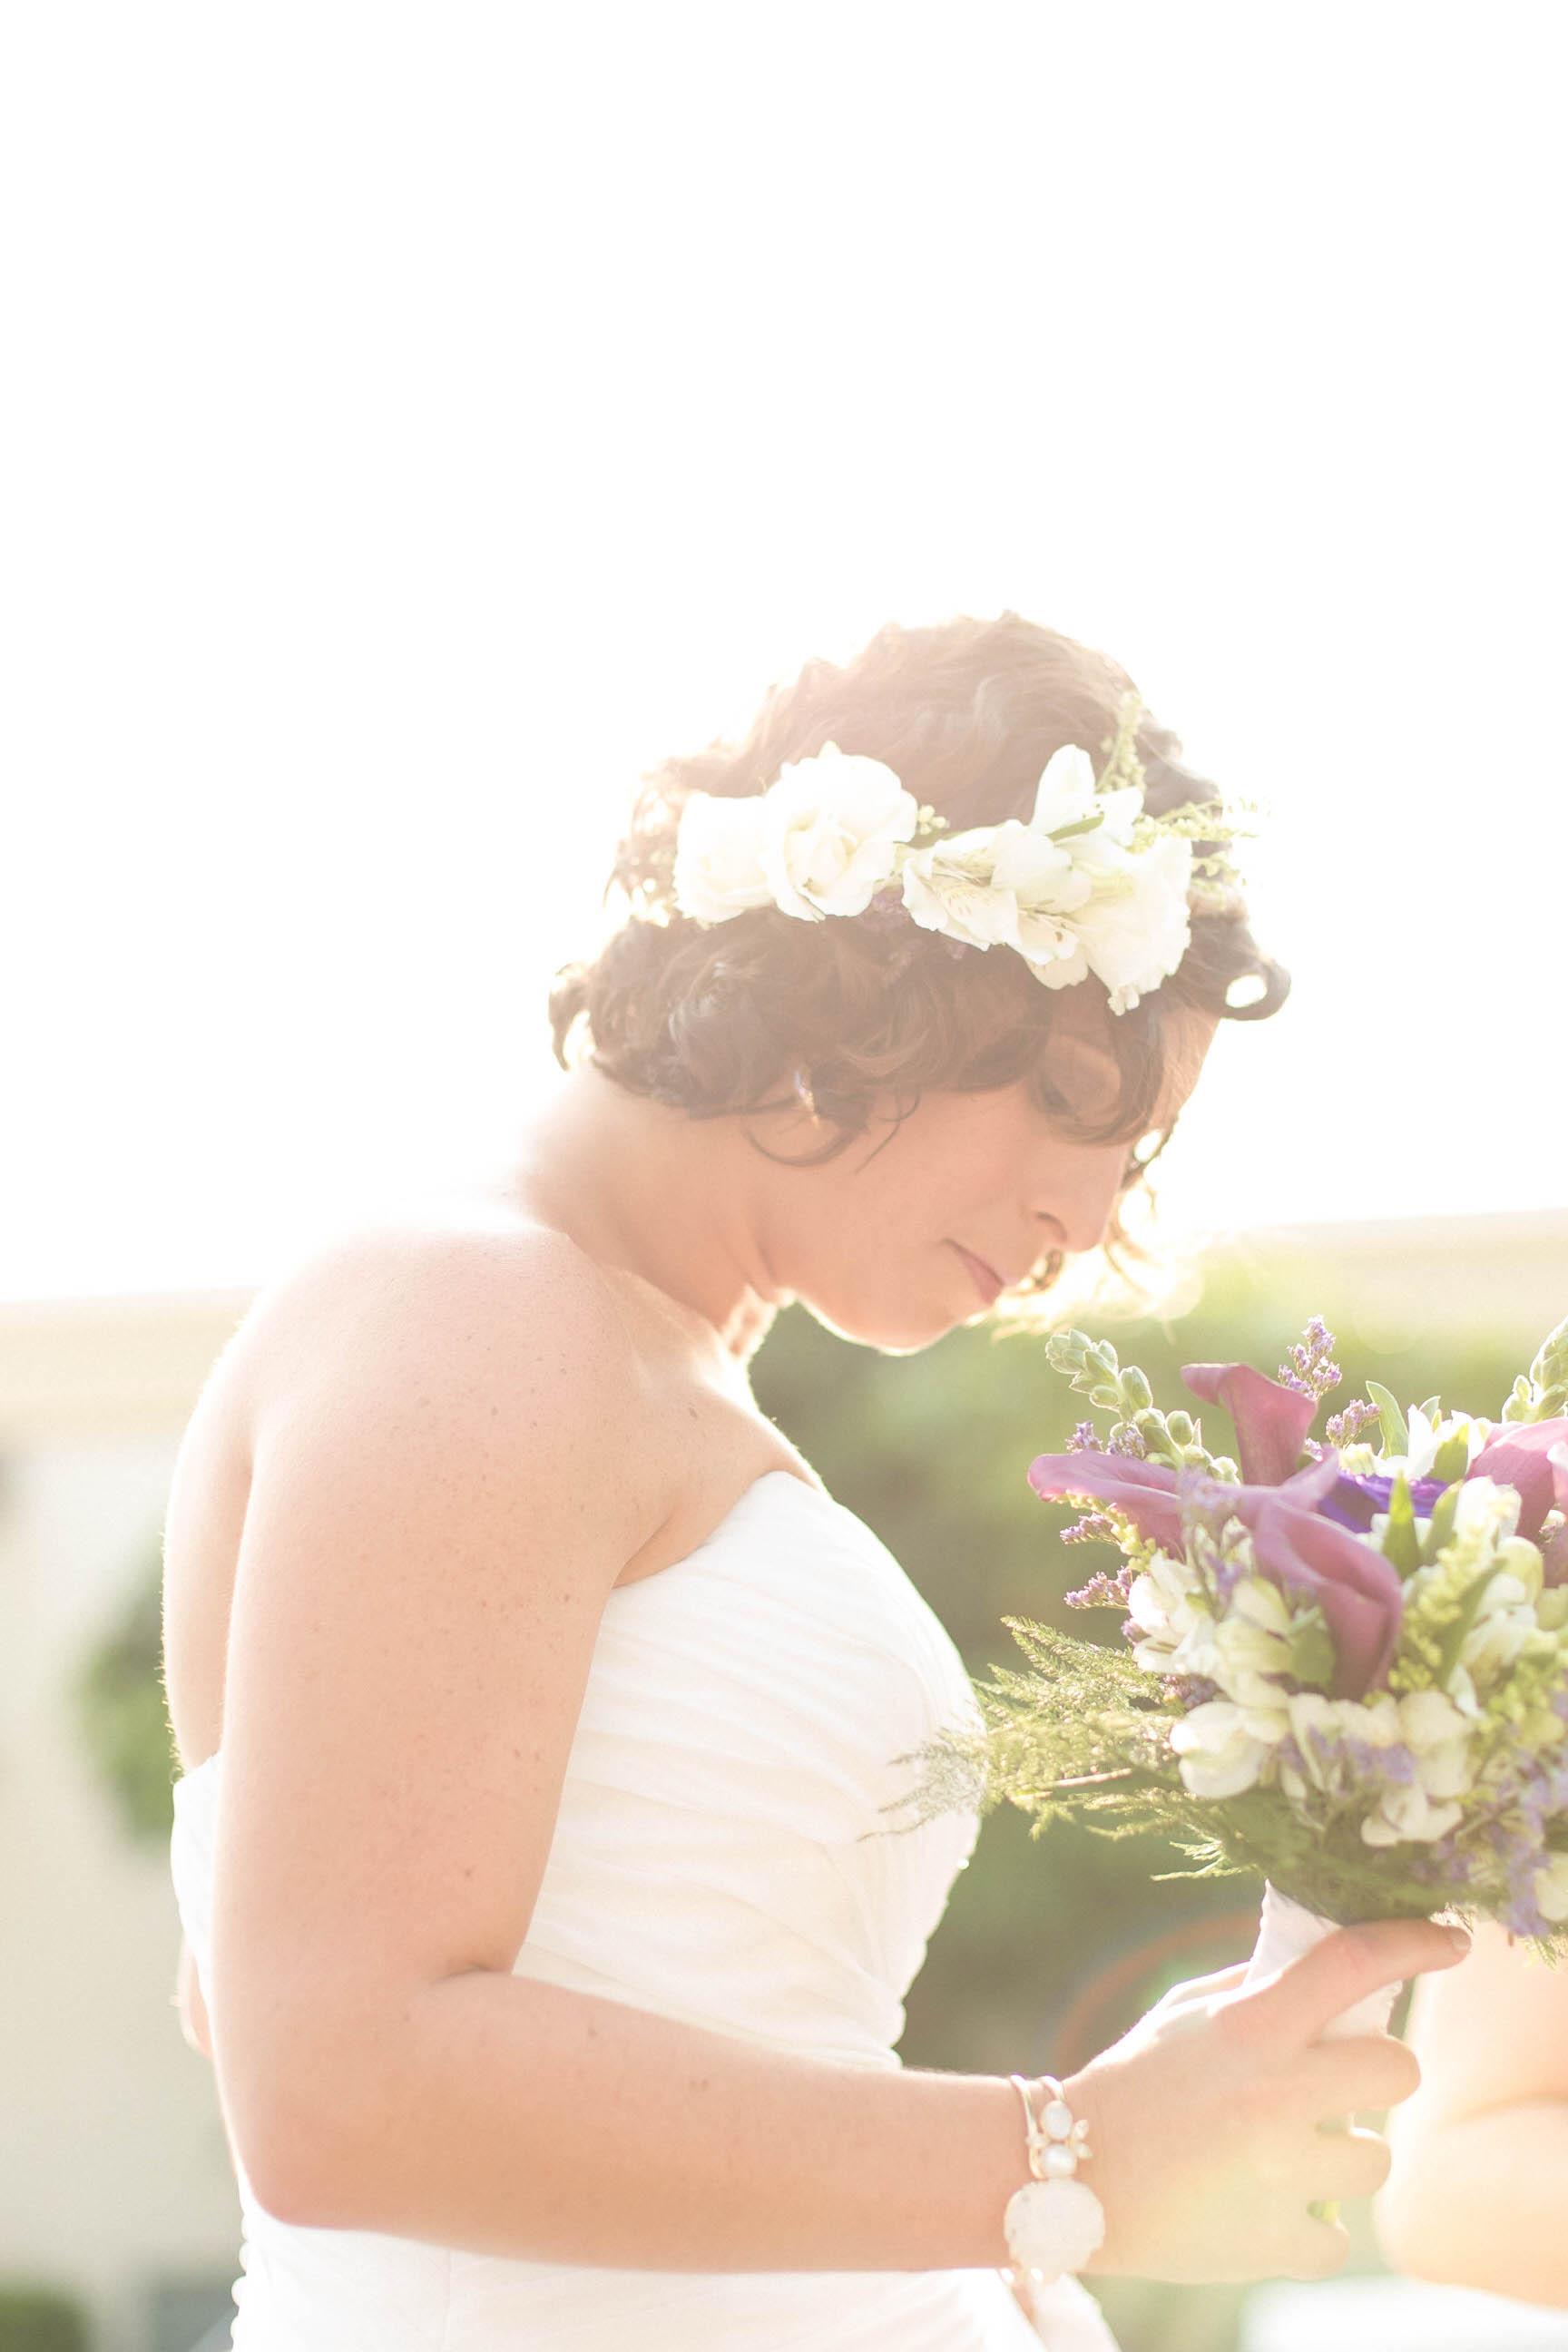 tiny-house-photo-bride-bouquet-sunlight-beautiful.jpg